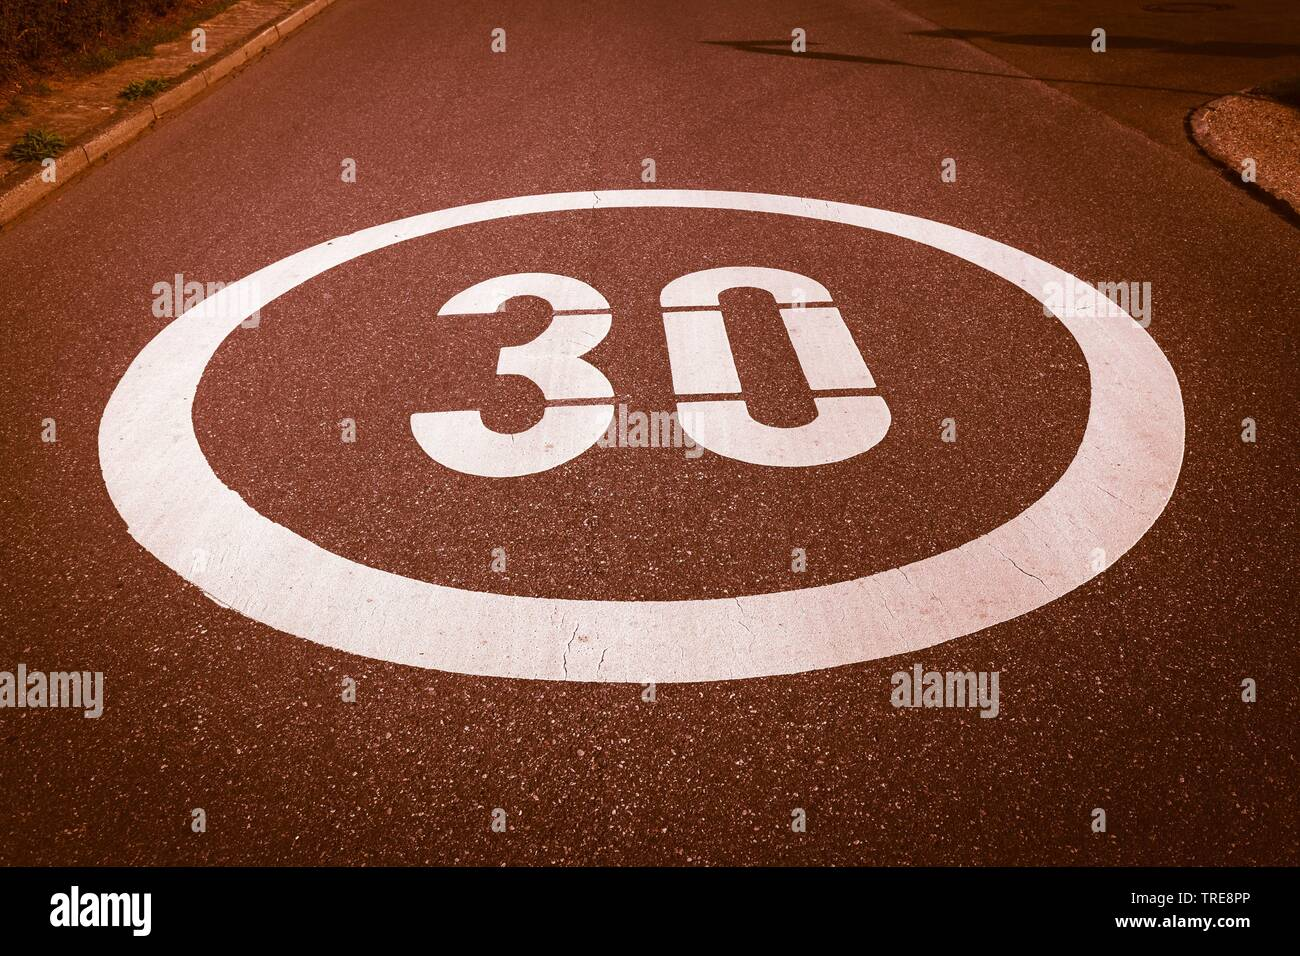 mark on asphalt, speed limit of 30 km/h, Germany Stock Photo